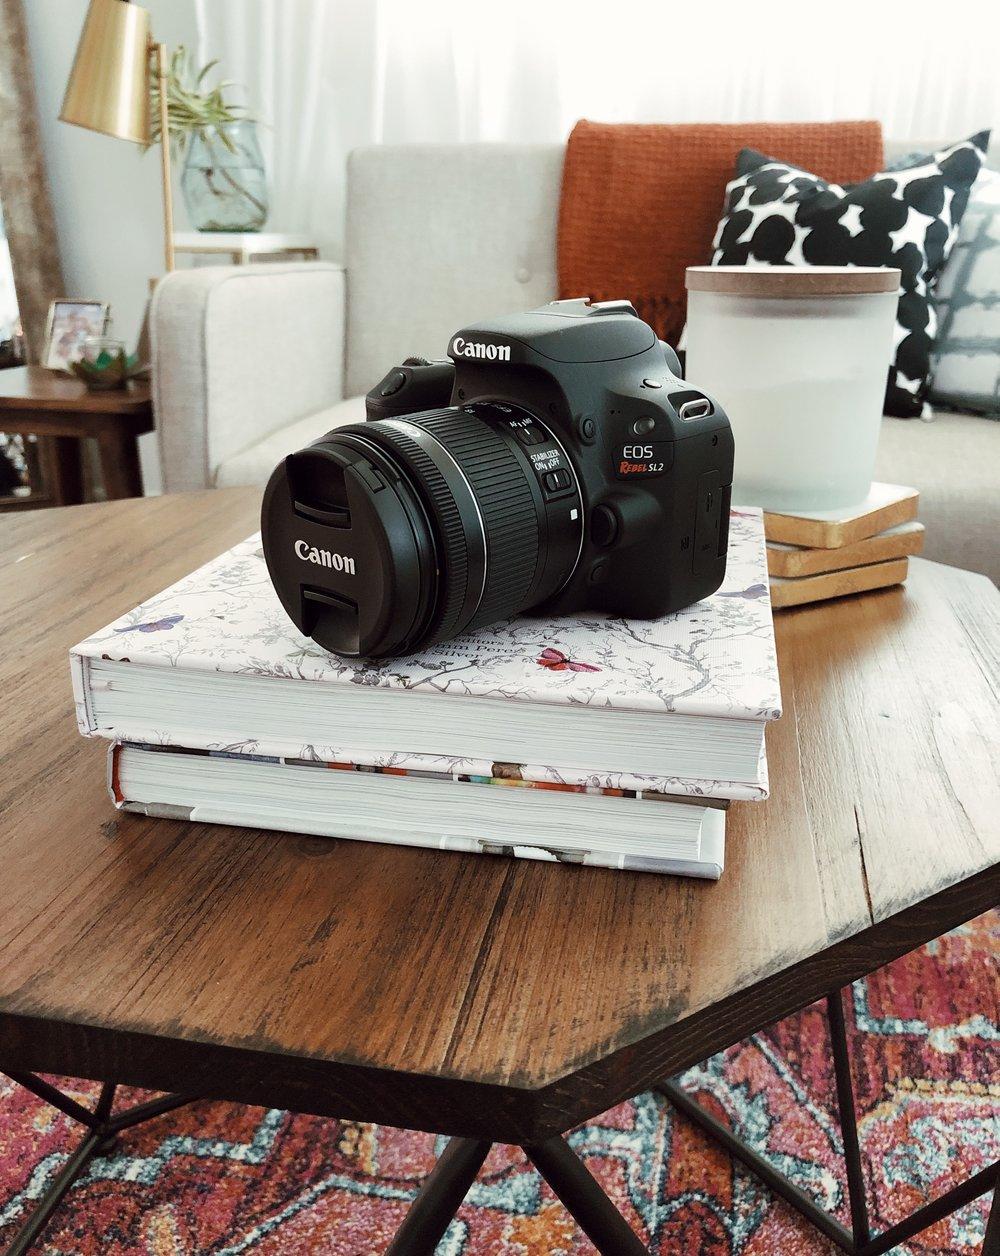 Canon EOS Rebel SL2 DSLR Camera.jpg